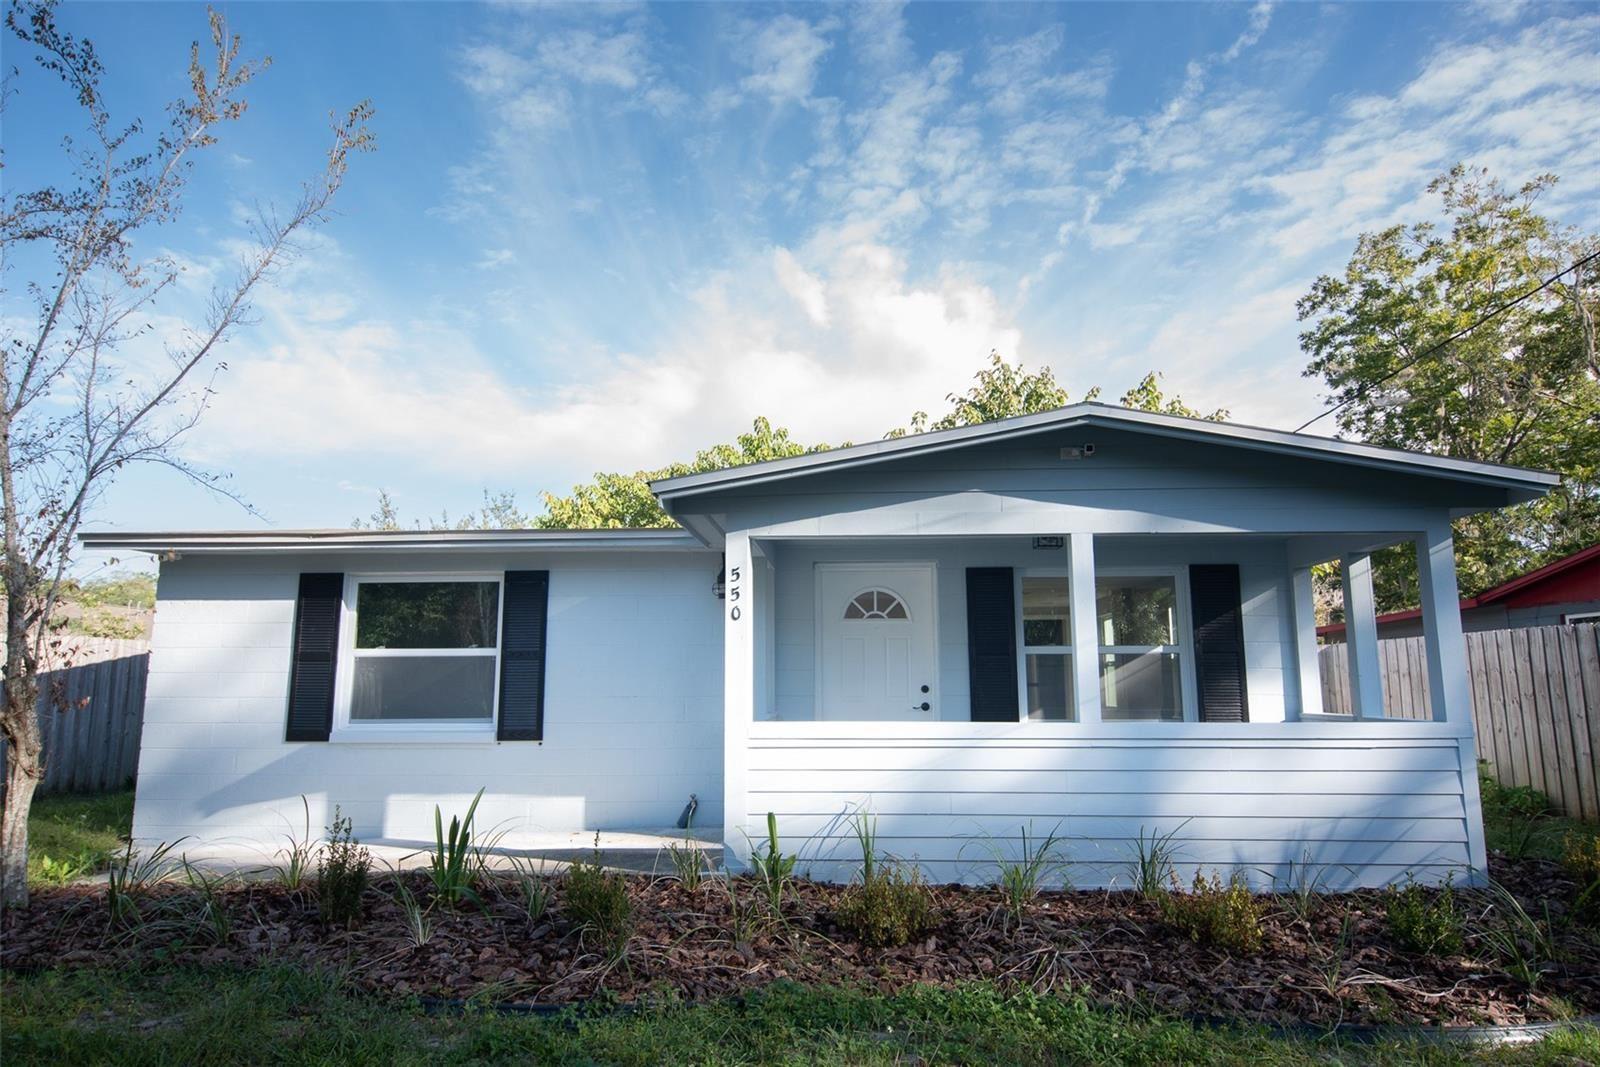 550 NW 26TH AVENUE, Gainesville, FL 32609 - #: GC447697